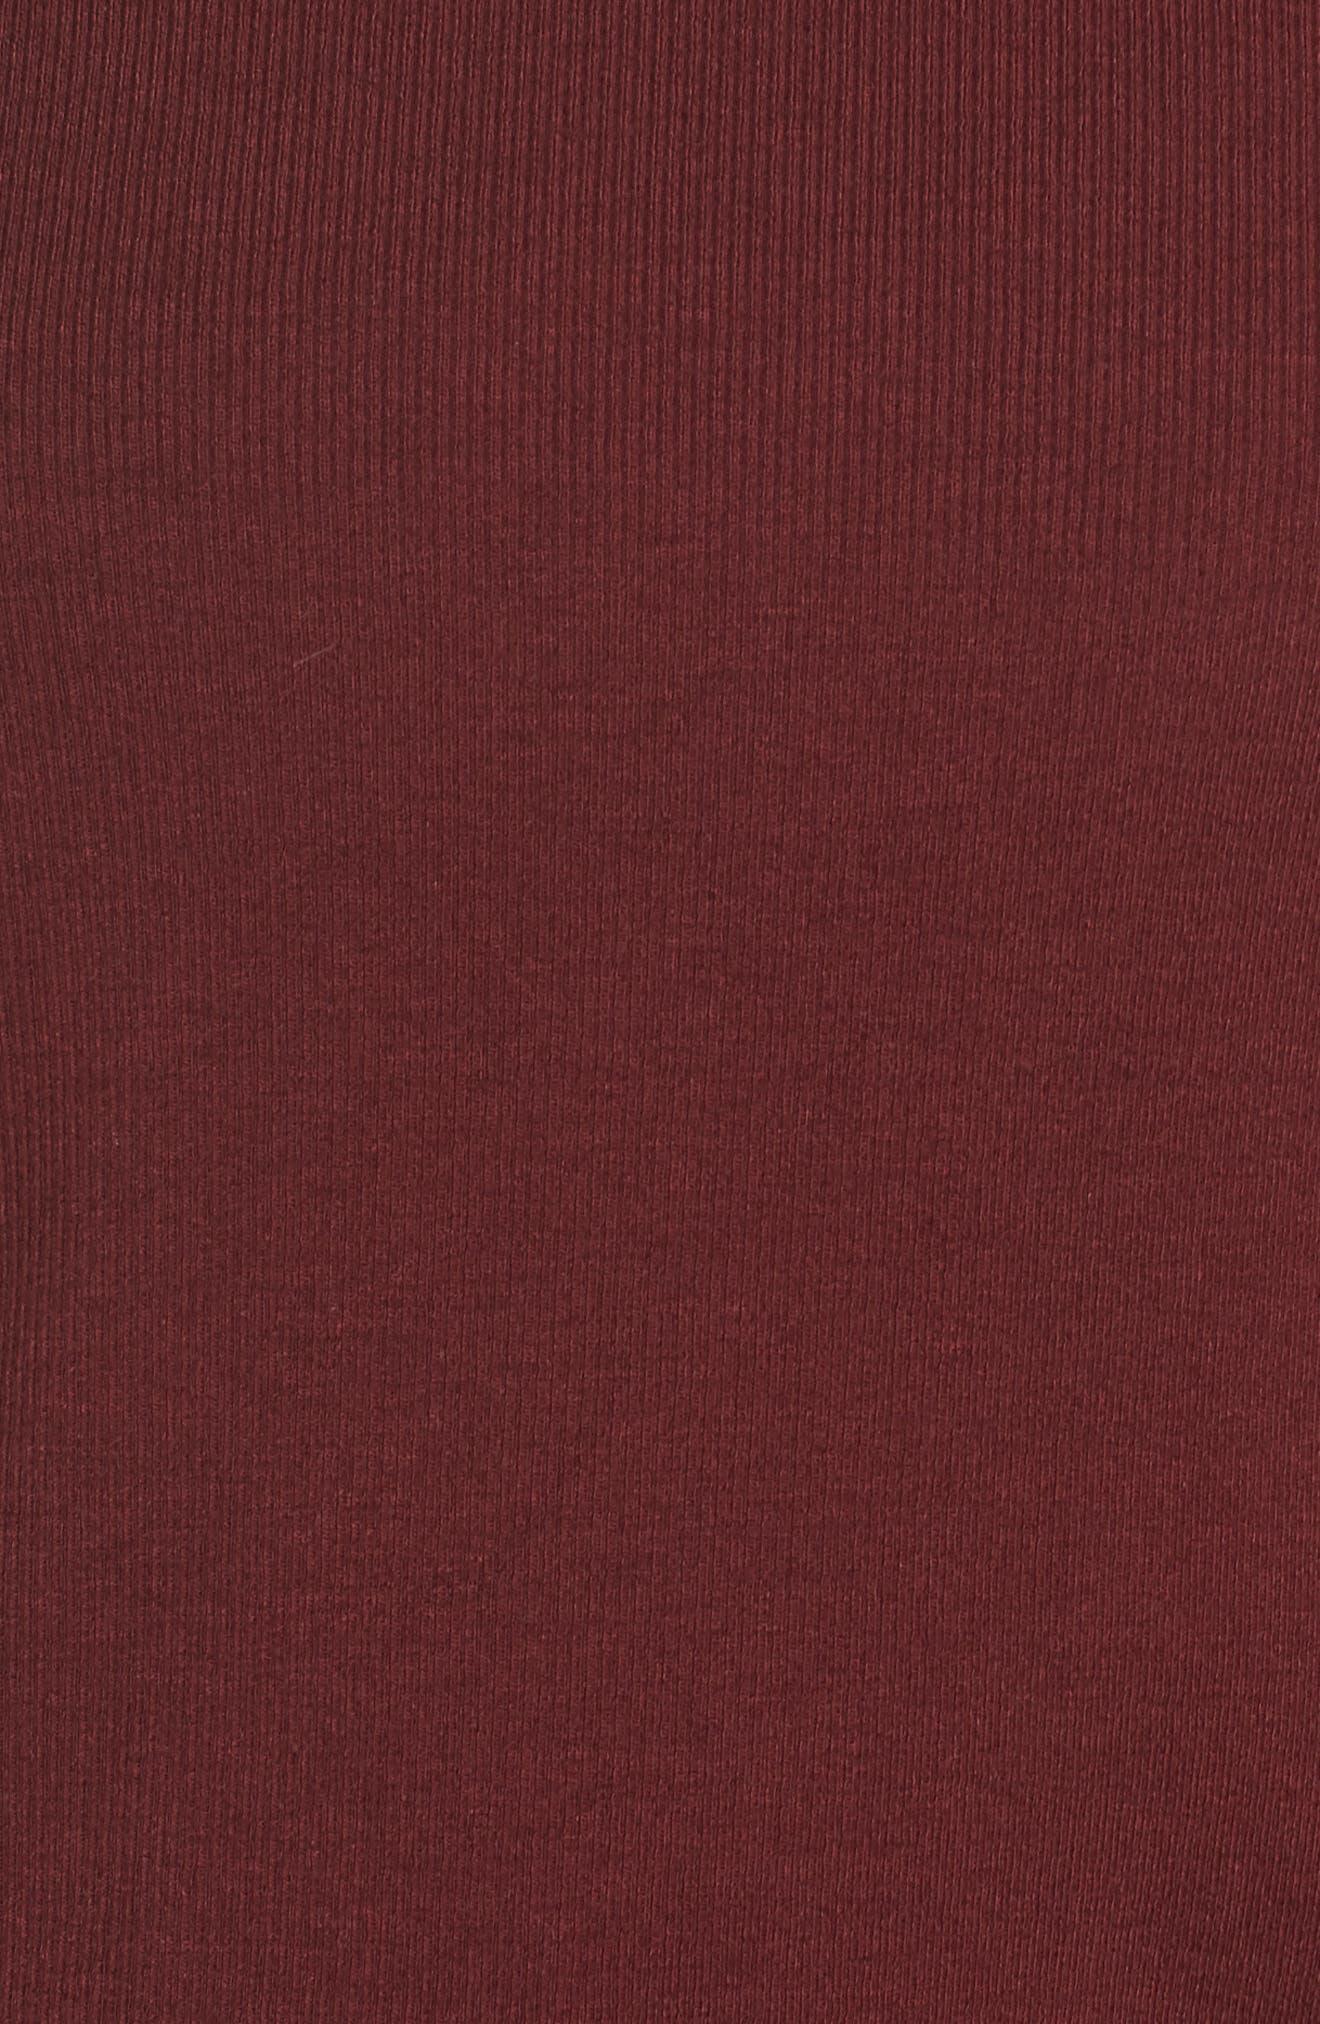 Defender Long-Sleeve Tee,                             Alternate thumbnail 6, color,                             600